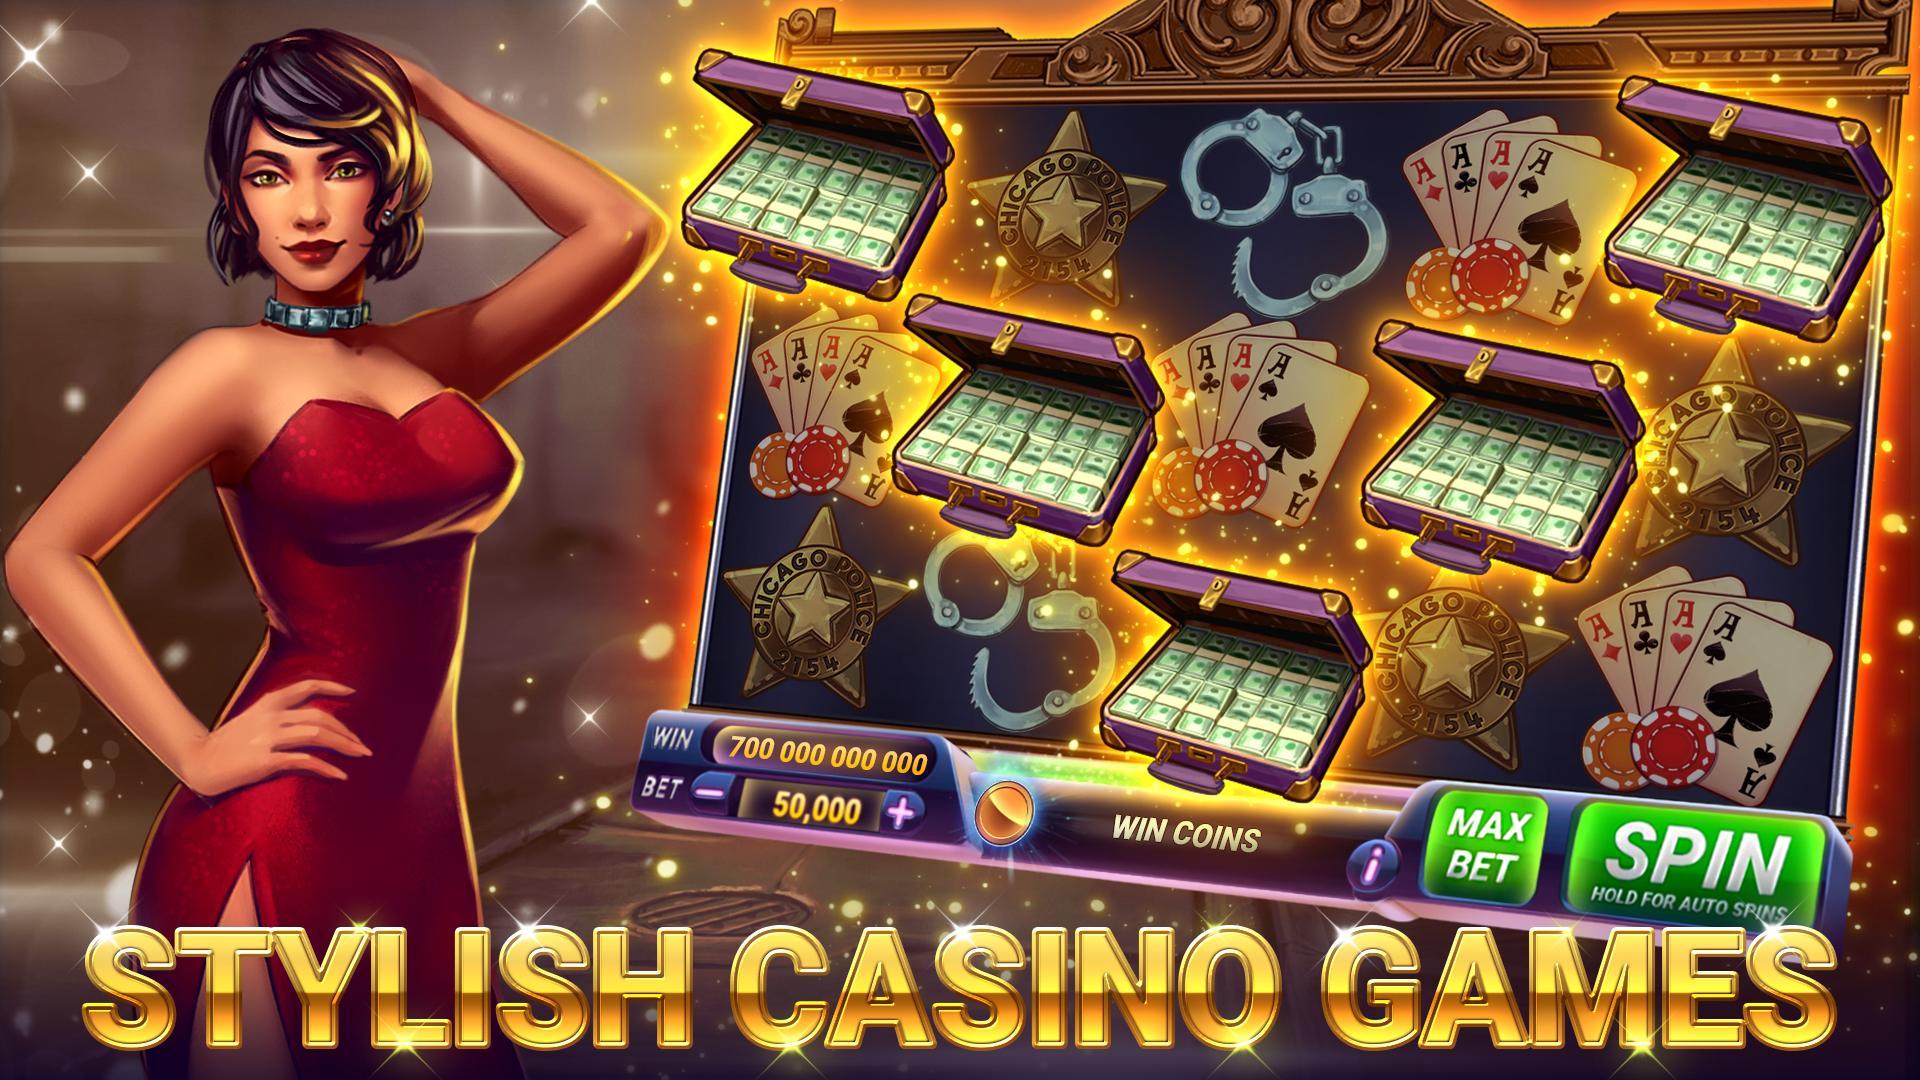 Download free video slot machines casino in cambodia poipet